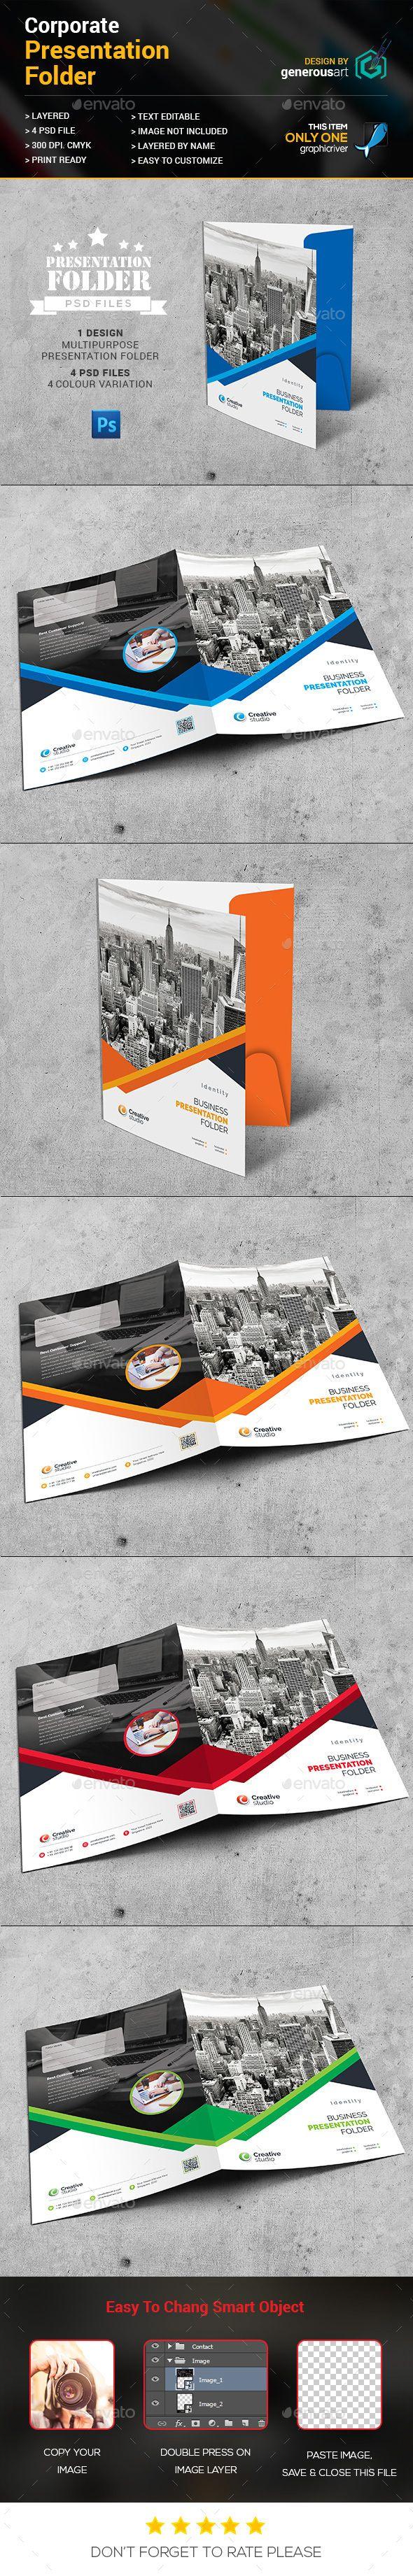 Best Presentation Folders Printed Folders Images On Pinterest - Fresh presentation folder template psd design